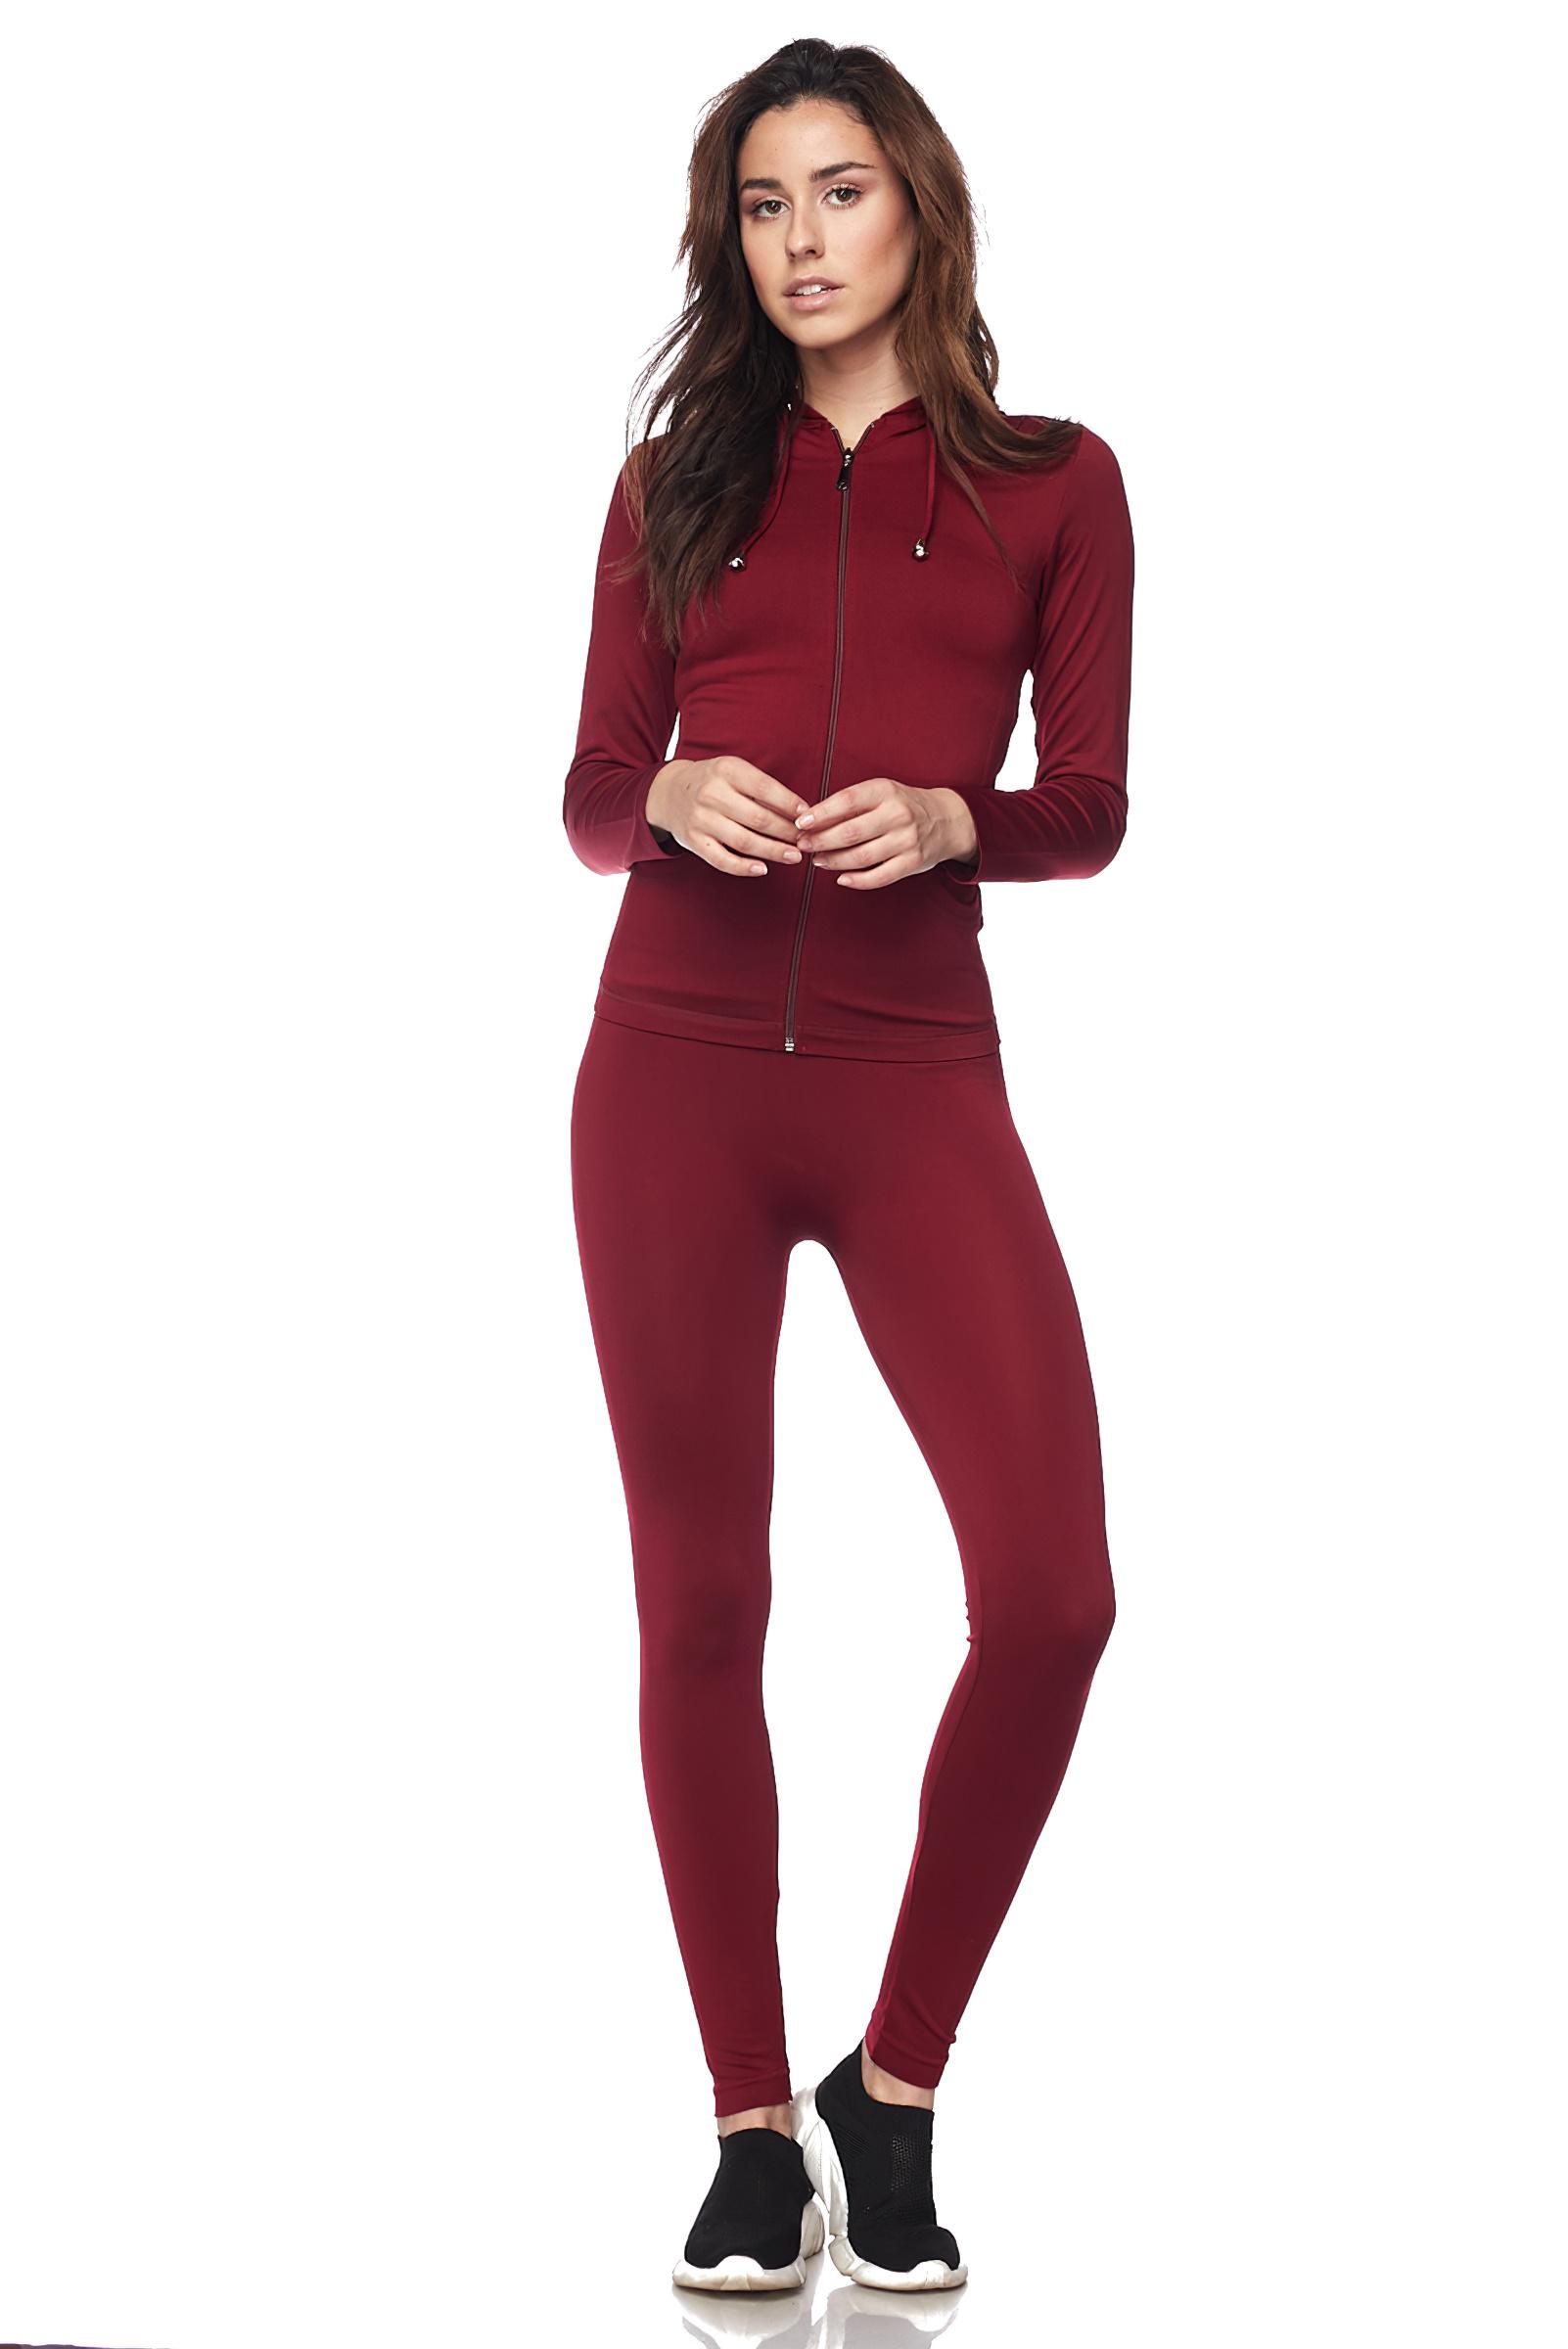 Women-039-s-Juniors-Active-Set-Wear-Zip-Up-Hoodie-and-Legging thumbnail 21